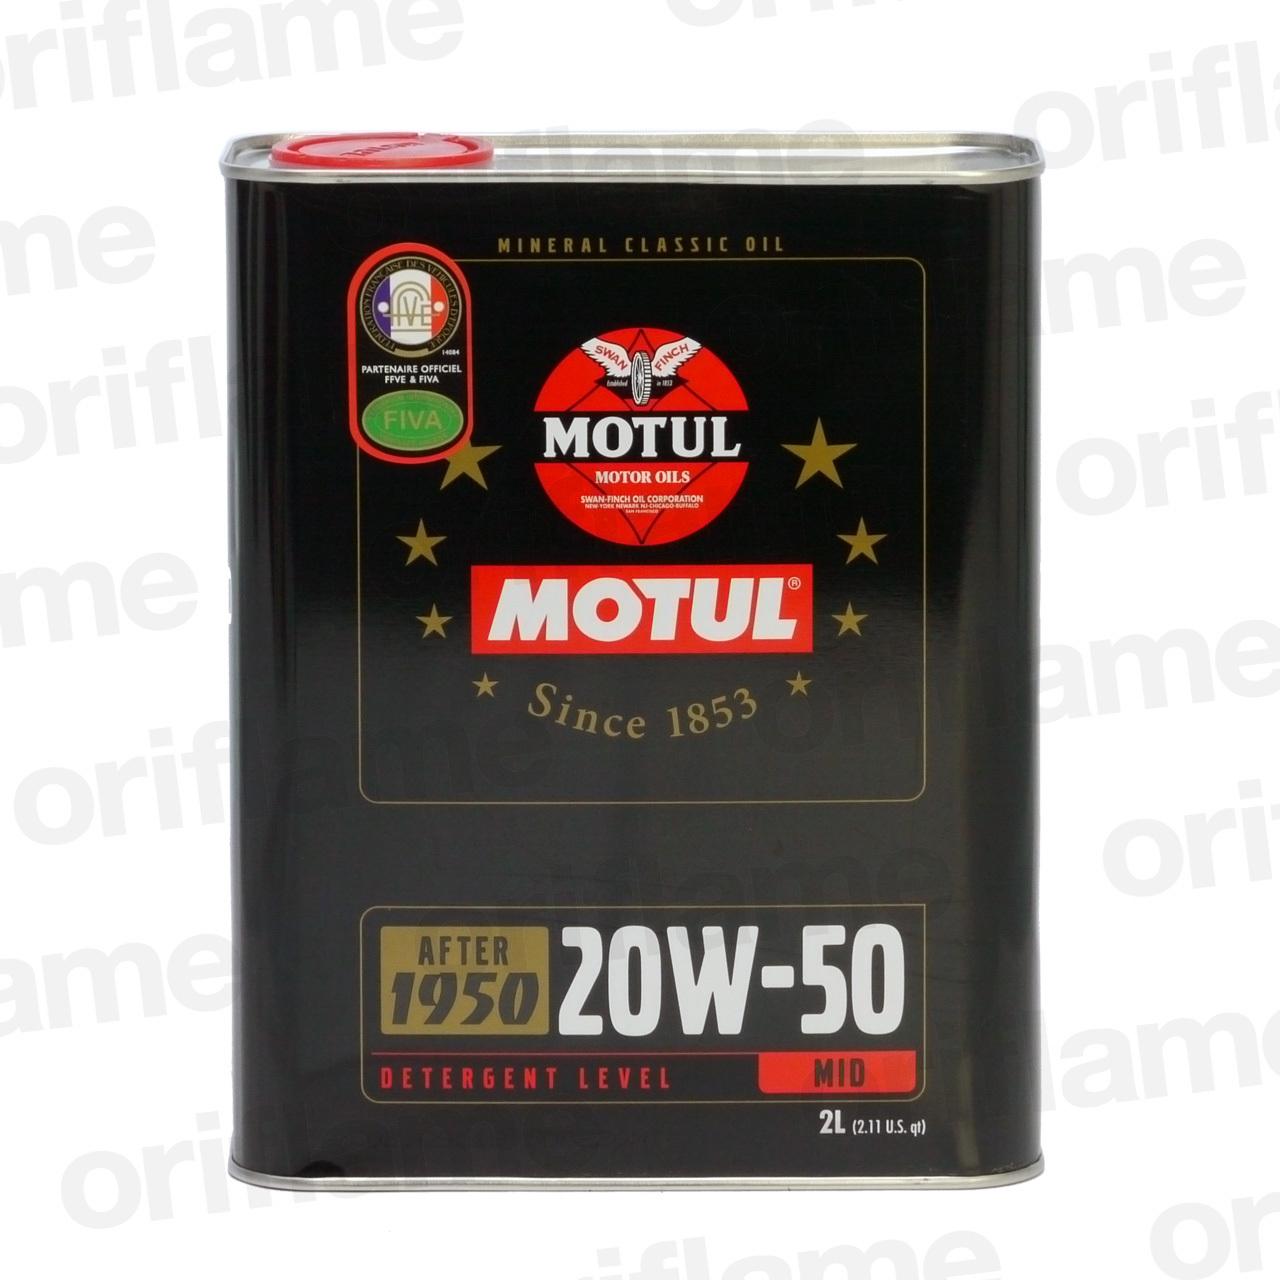 MOTUL・クラシック・オイル 20W-50 2L 鉱物油